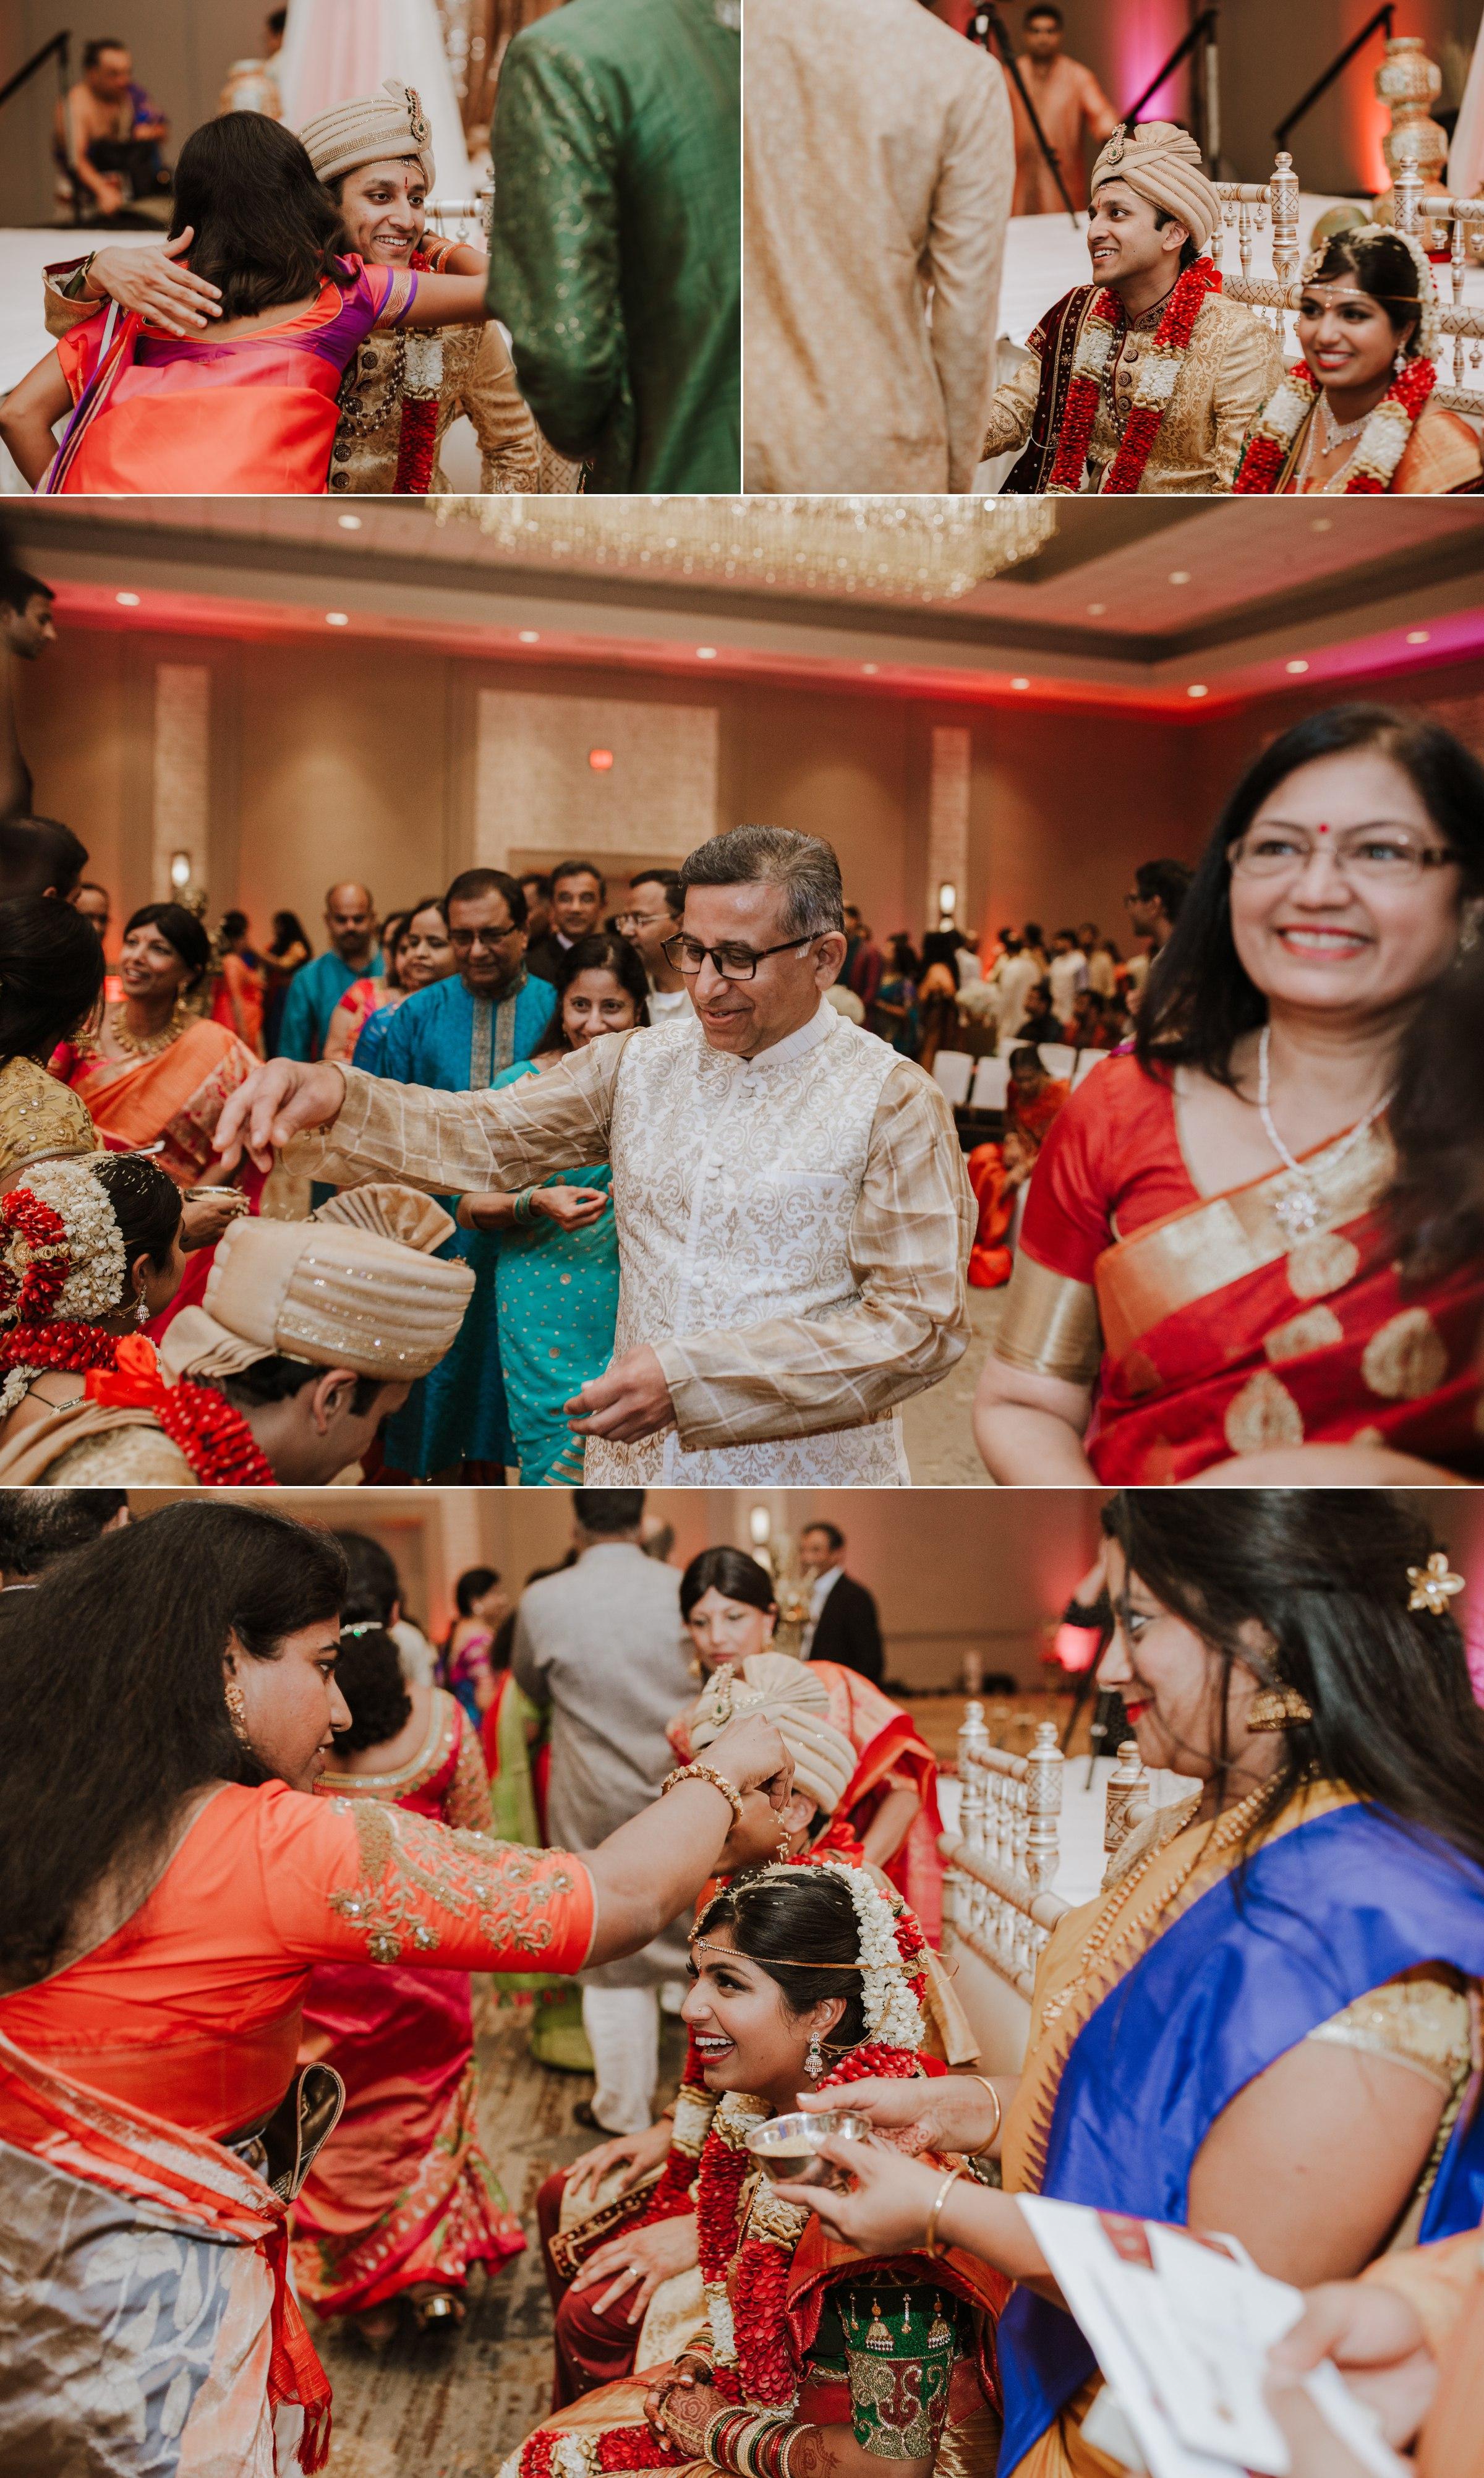 indian wedding minneapolis minnesota texas austin wedding elopement destination intimate best photographer_0041.jpg